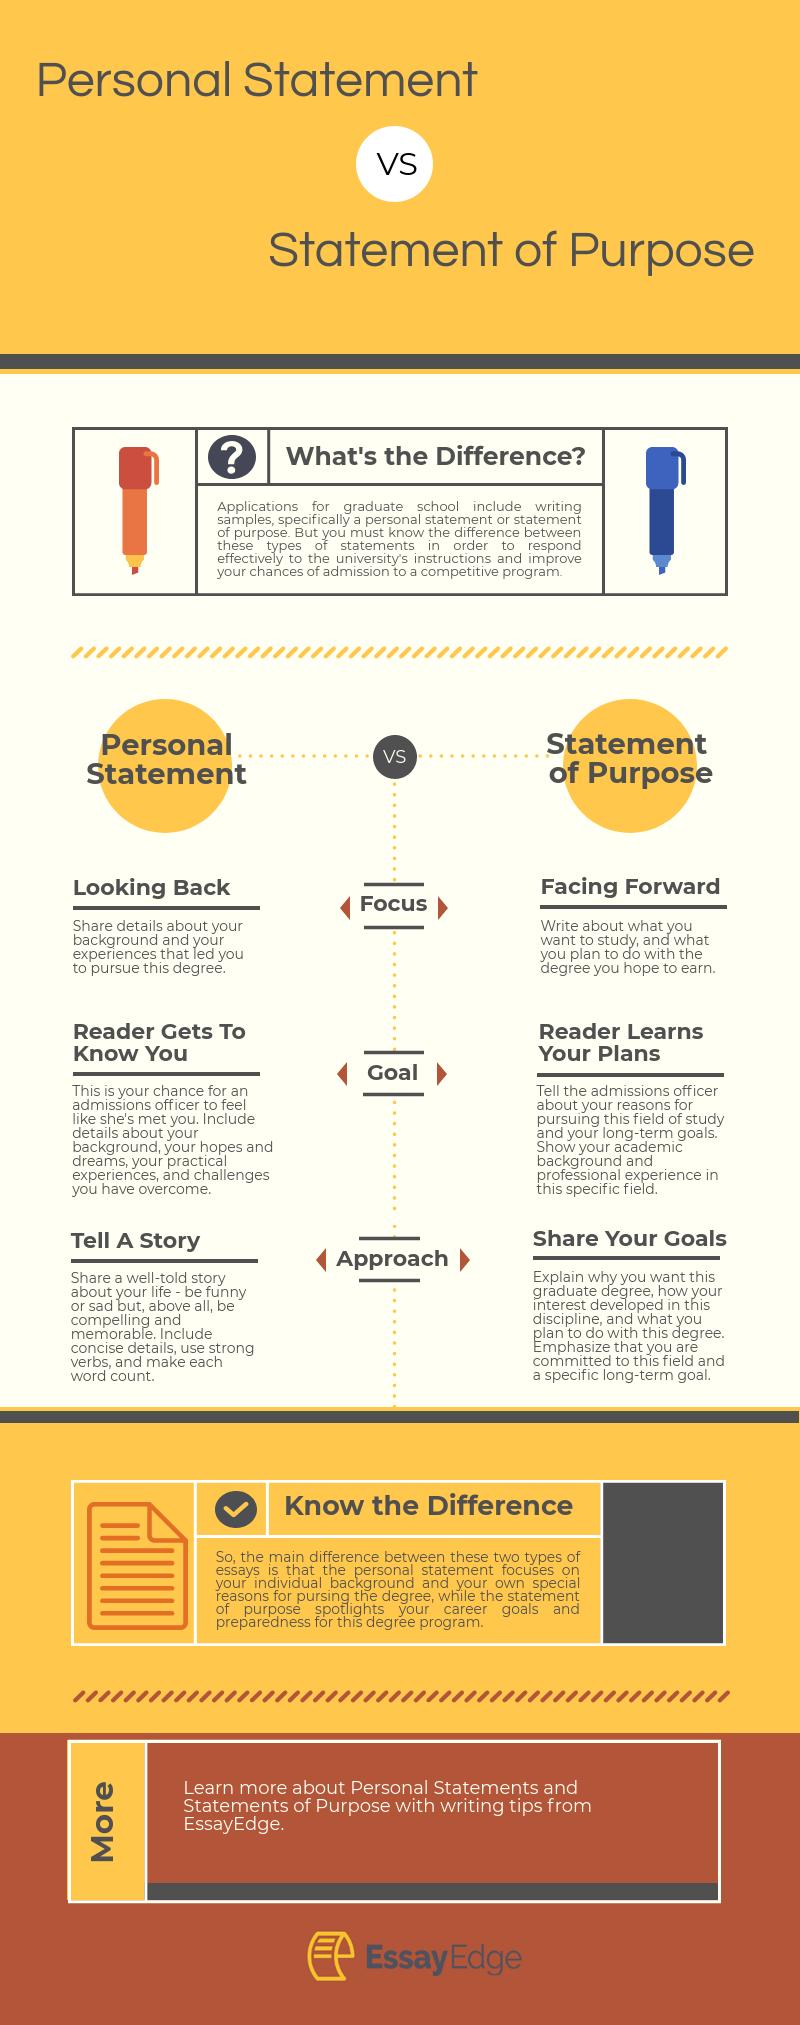 Personal Statement vs. Statement of Purpose